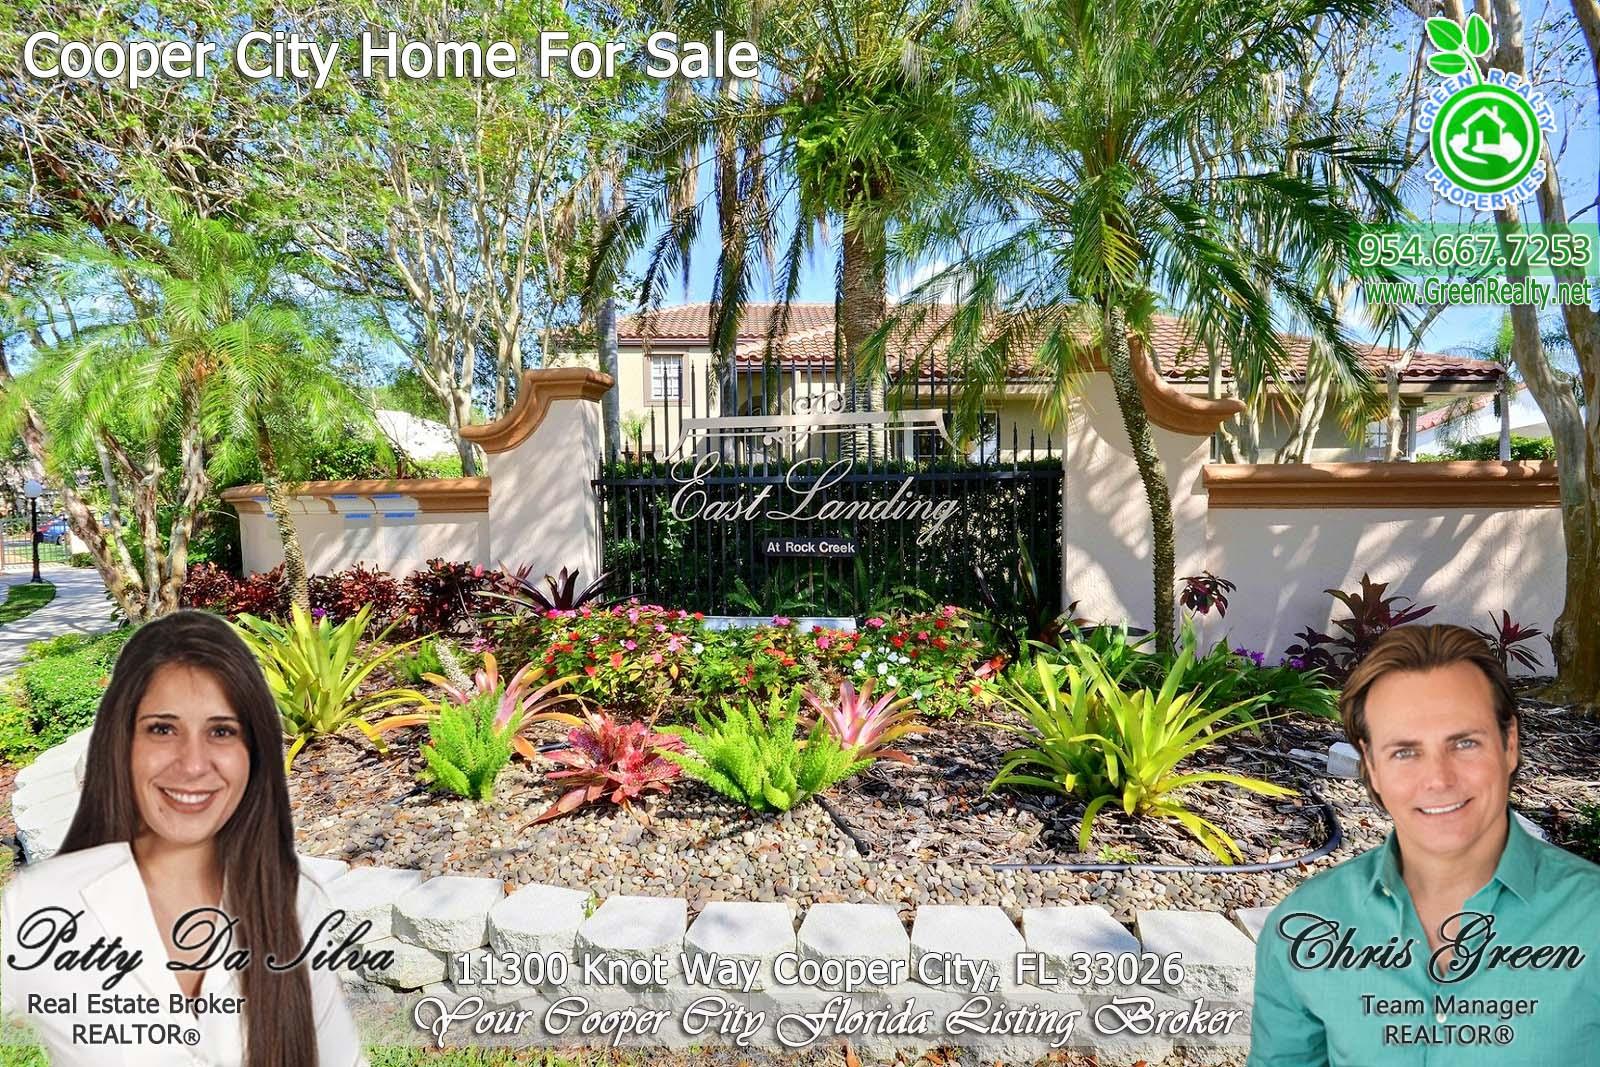 54 East Landing at Rock Creek Homes For Sale (1)